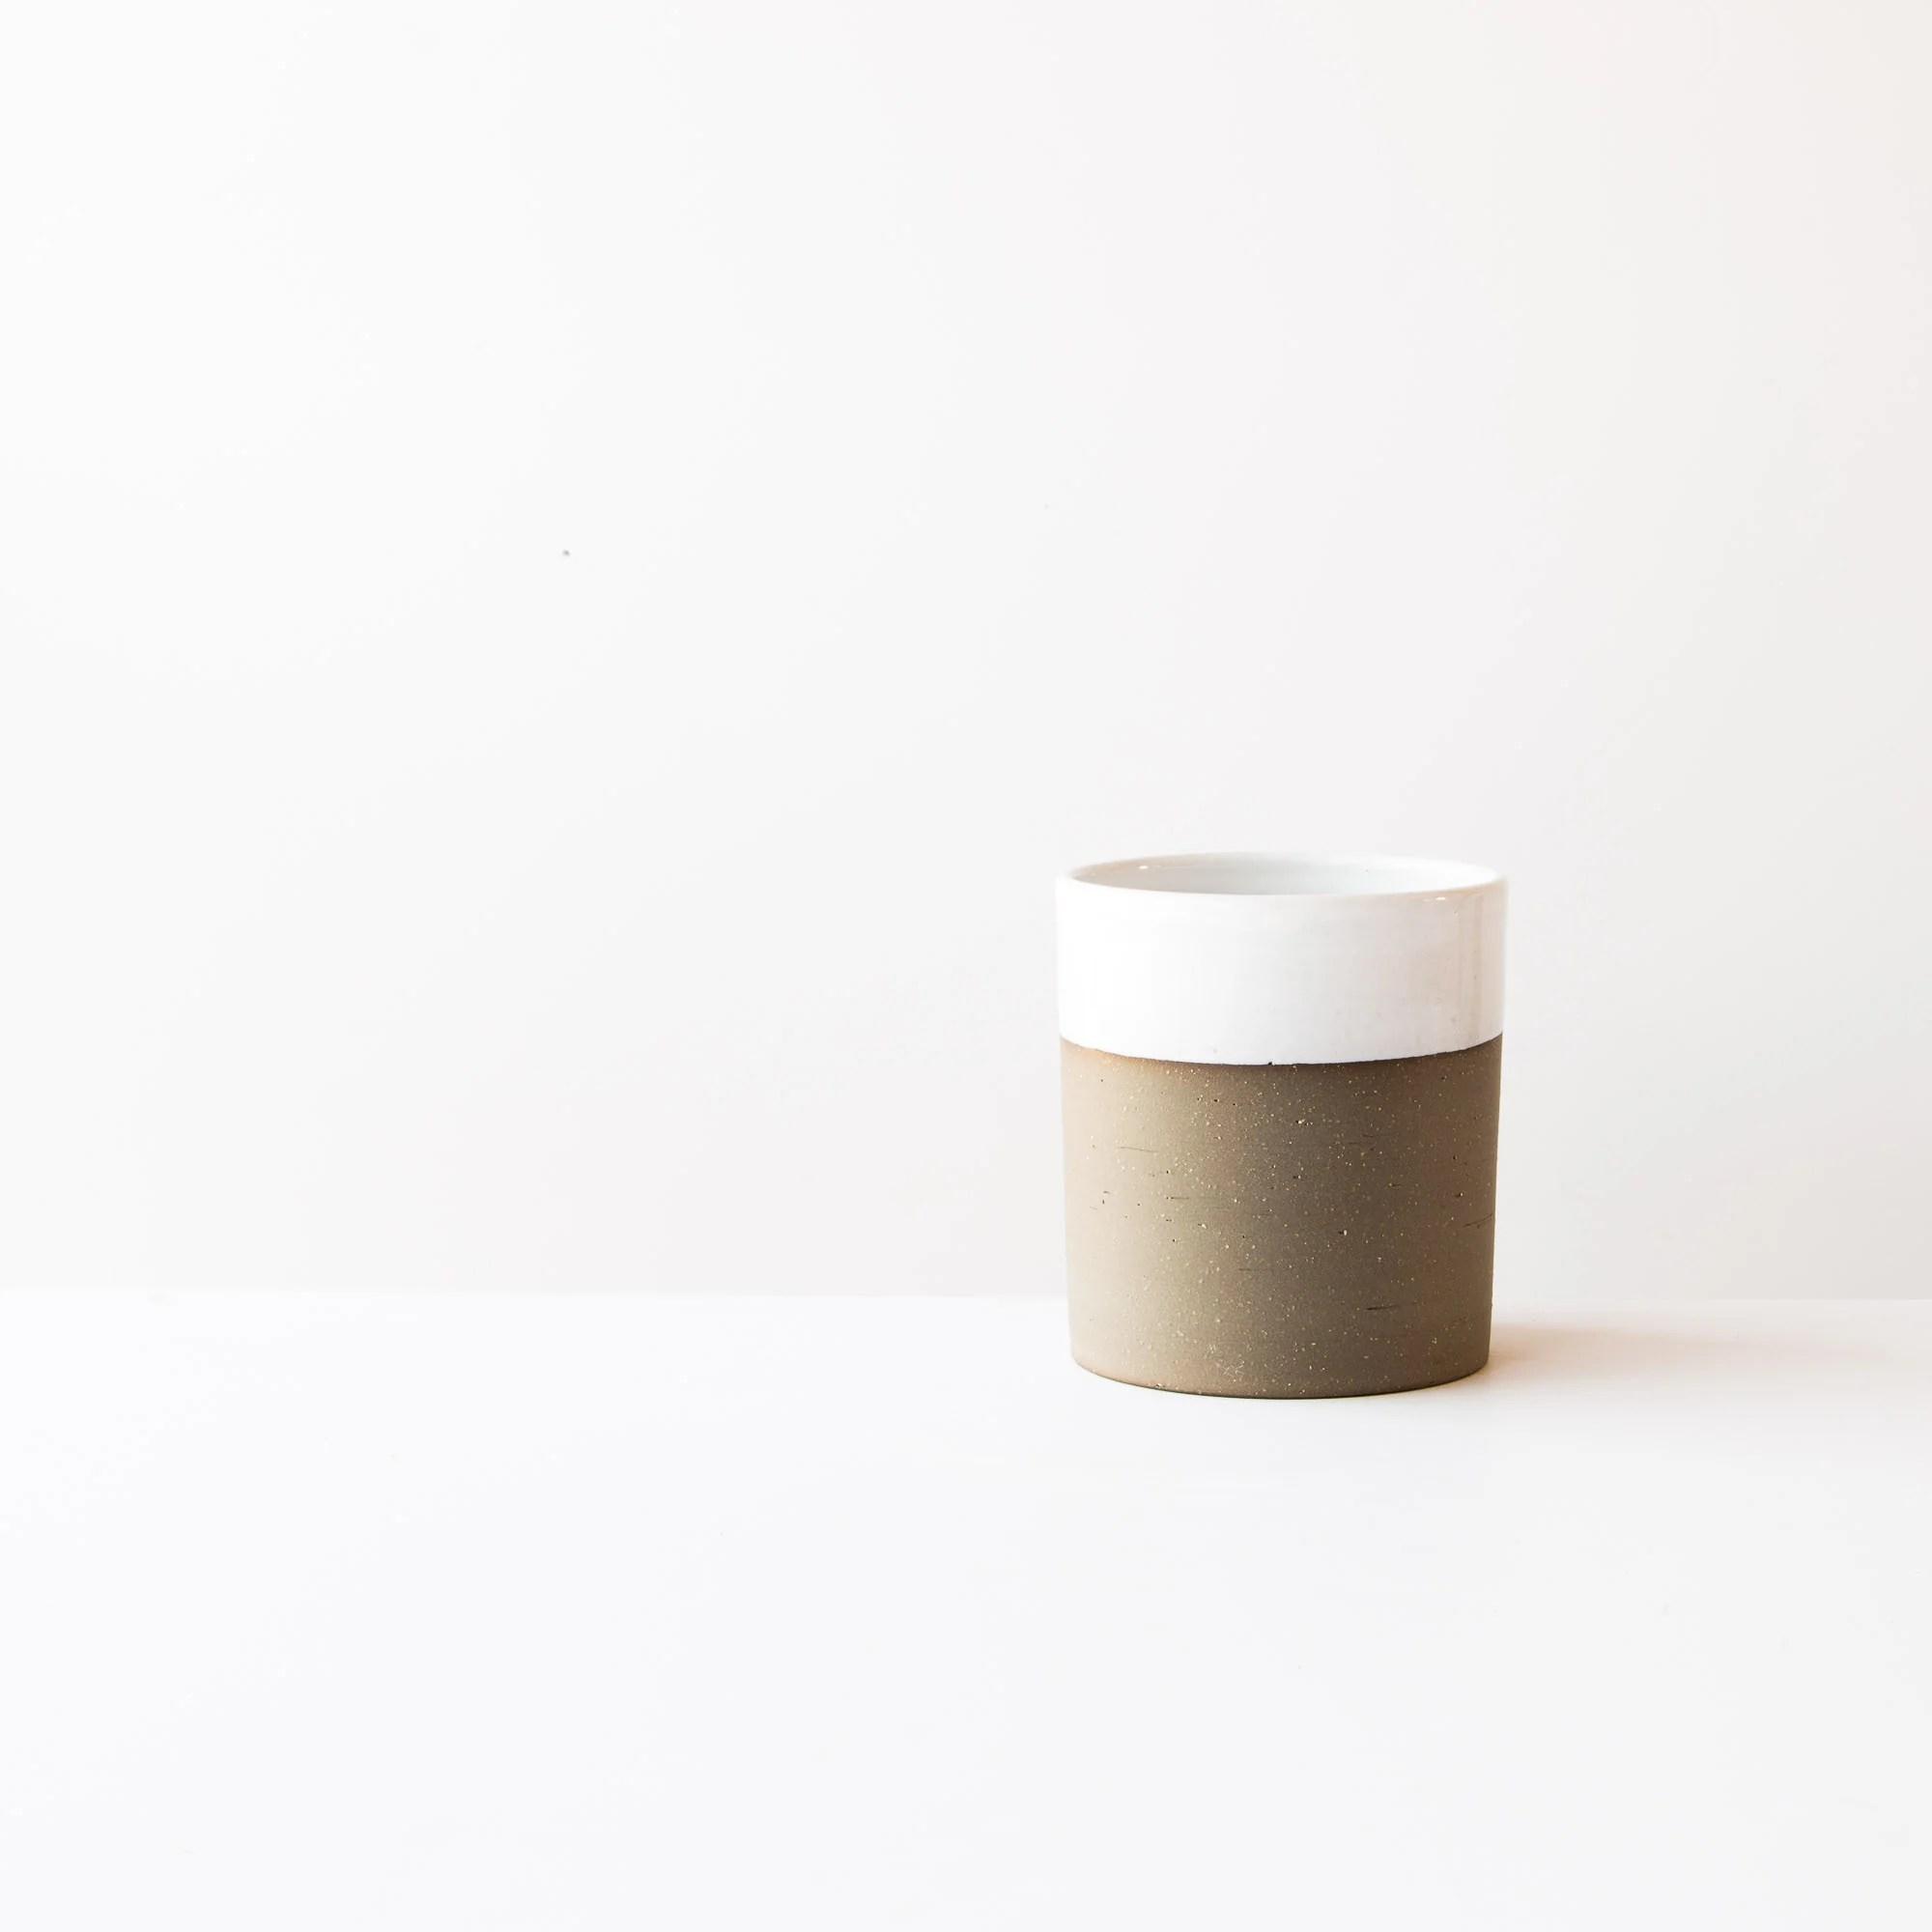 kitchen crock cabinet layout tool ceramic ustensil ice bucket wine chiller handmade chic basta